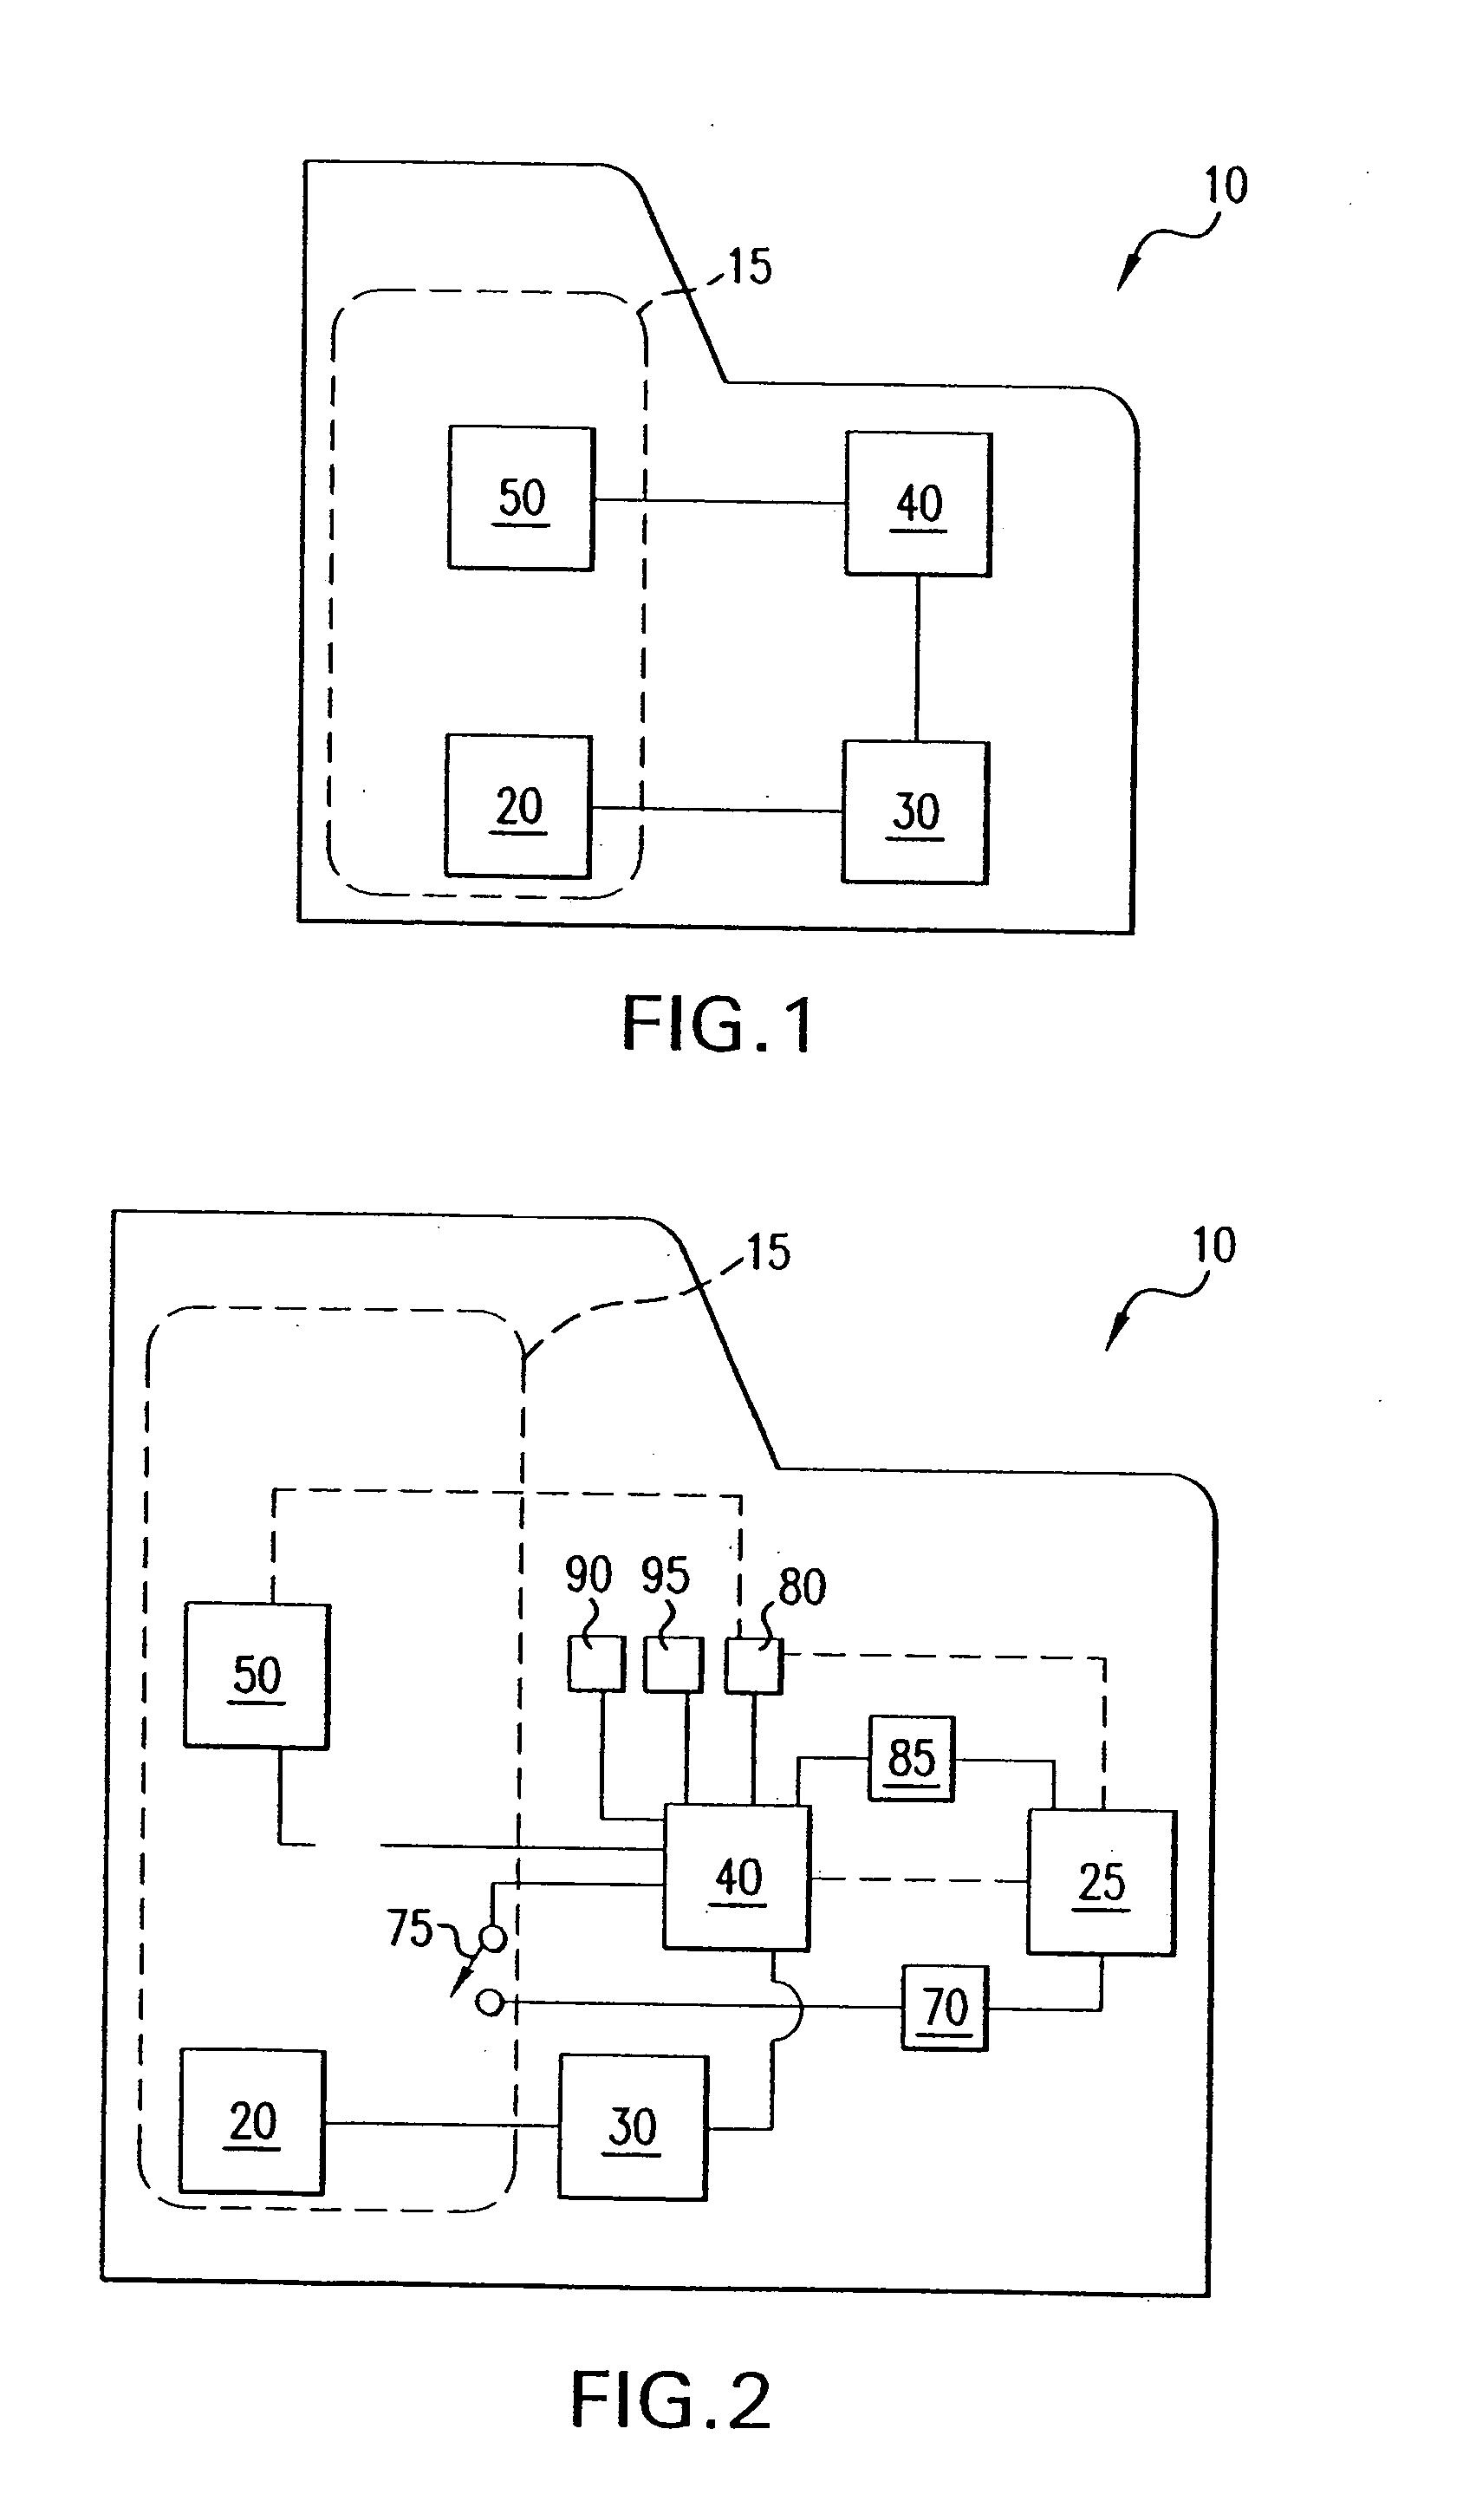 US07138923 20061121 D00001?resize=665%2C1145 cruisecontrol 9200i international truck wiring diagram 1996 international 9200i wiring diagram at n-0.co